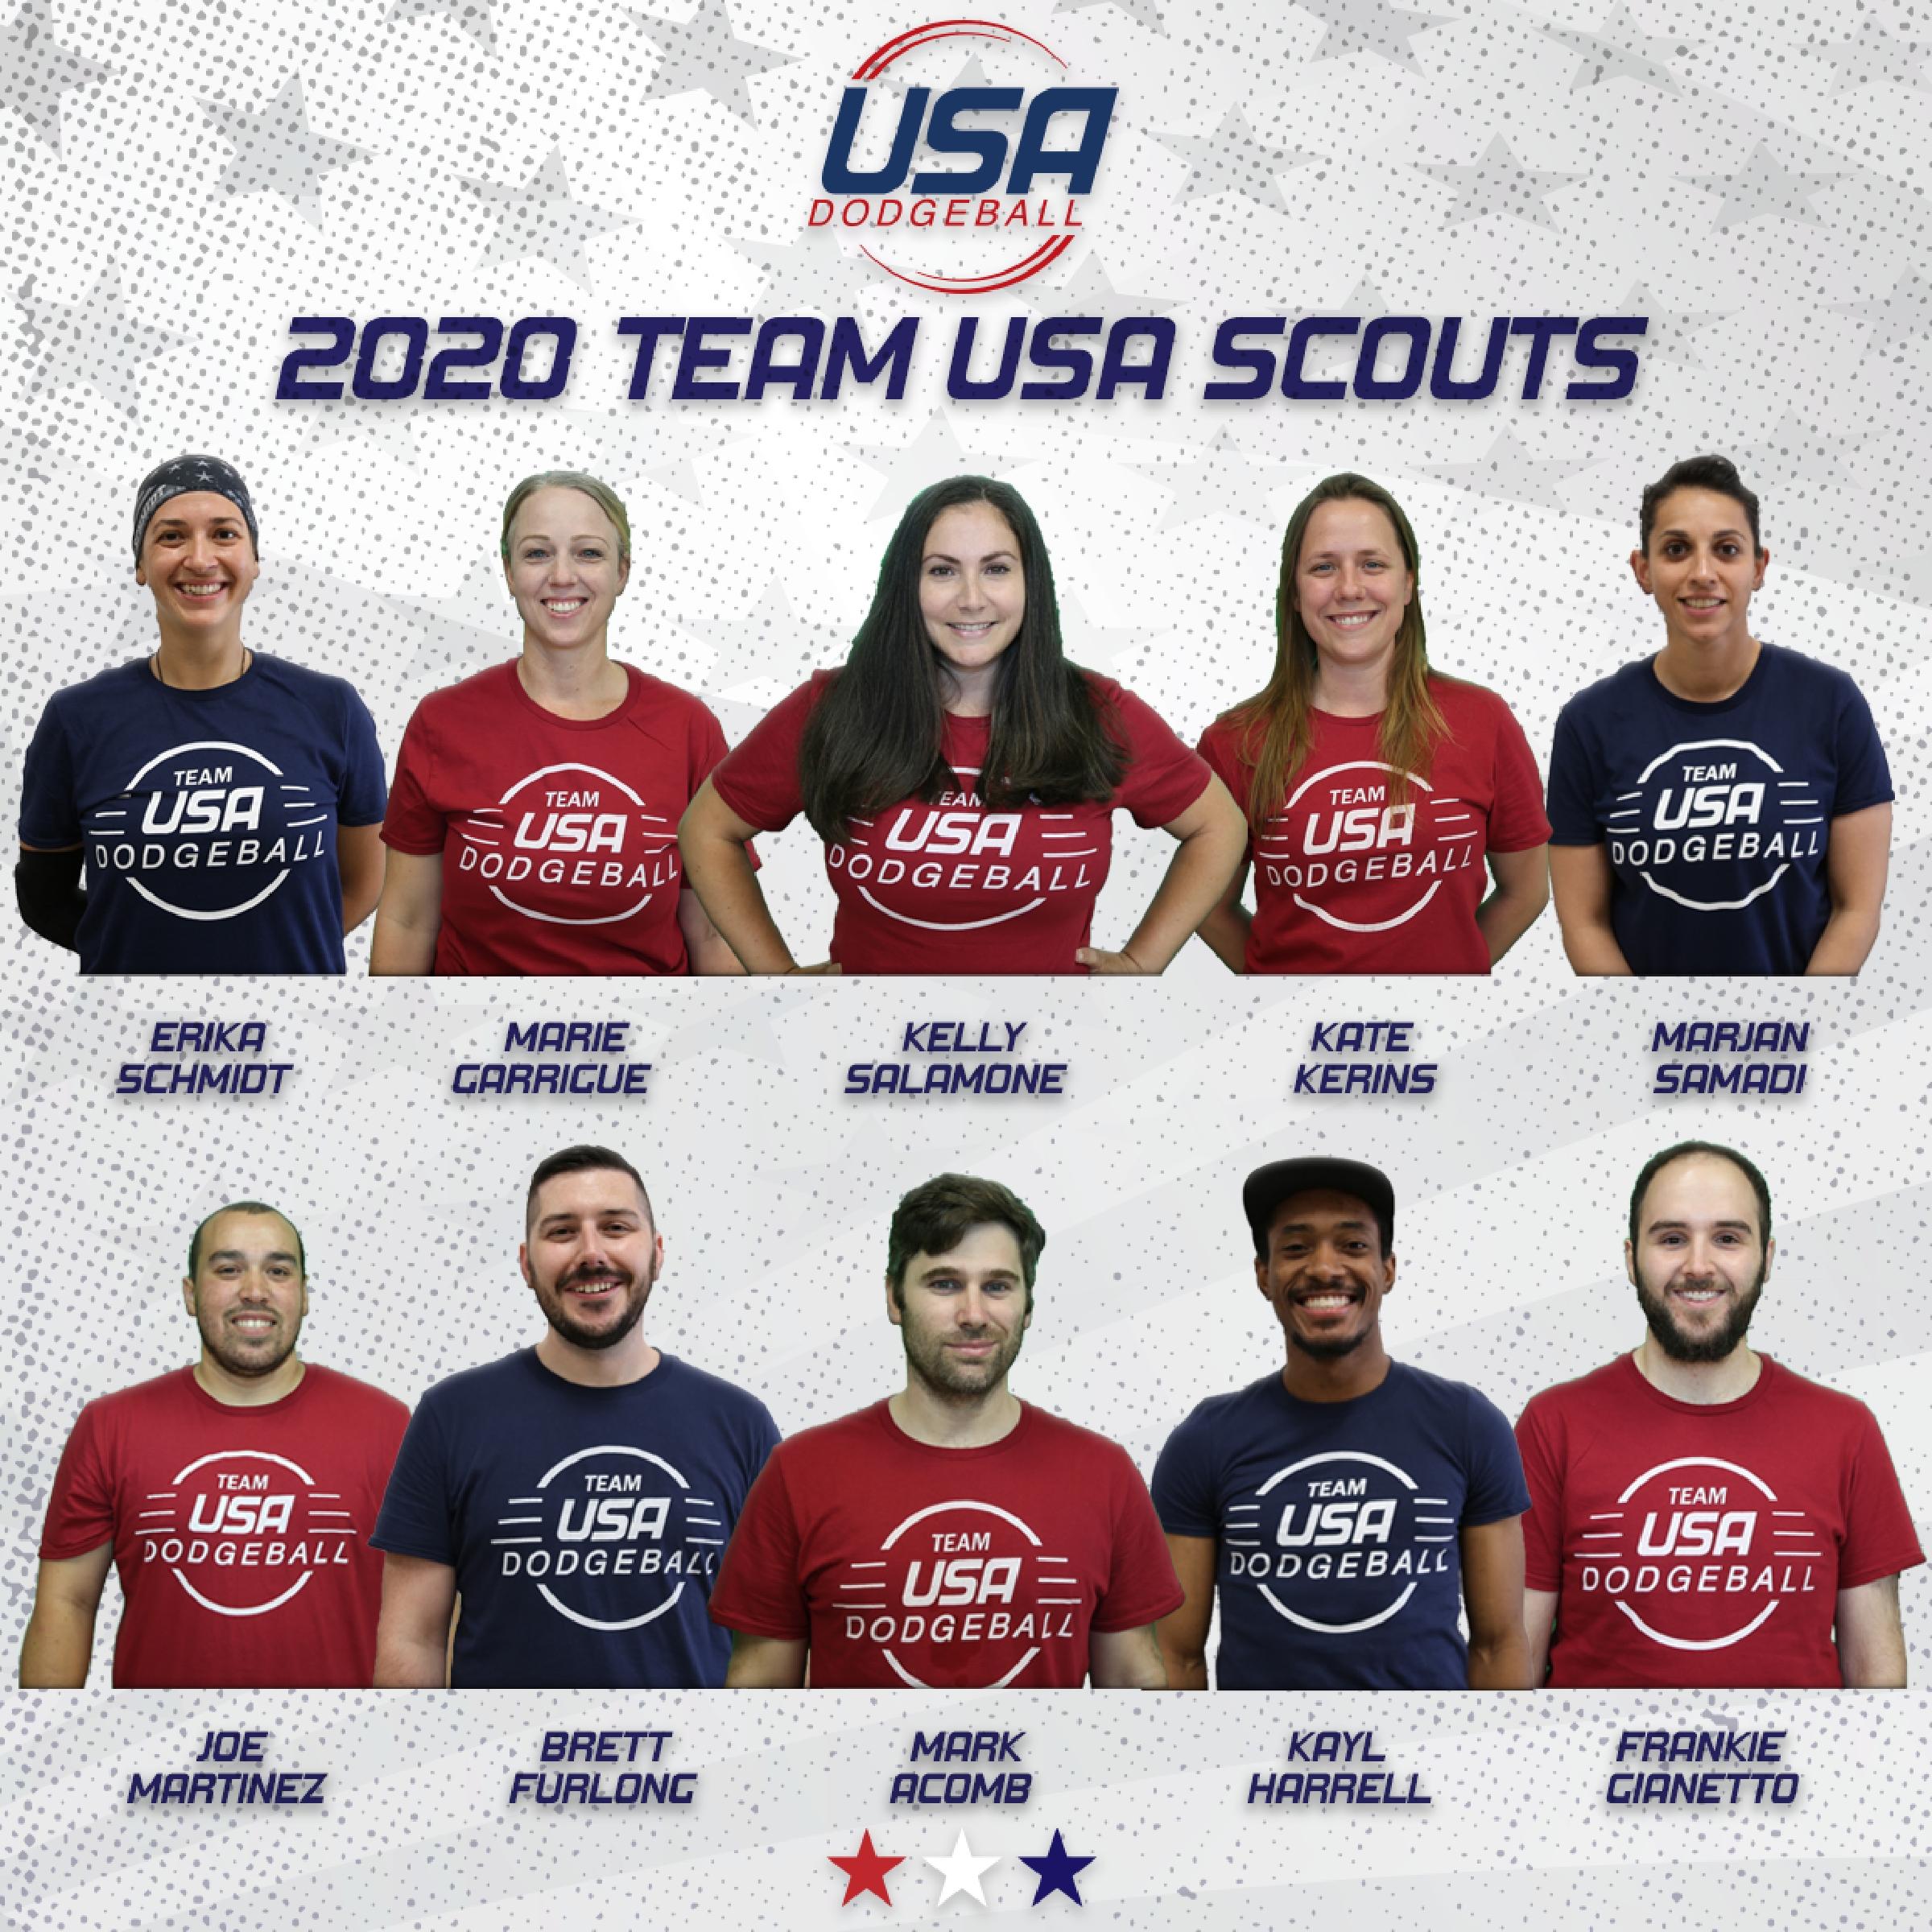 2020 Team USA Scouts